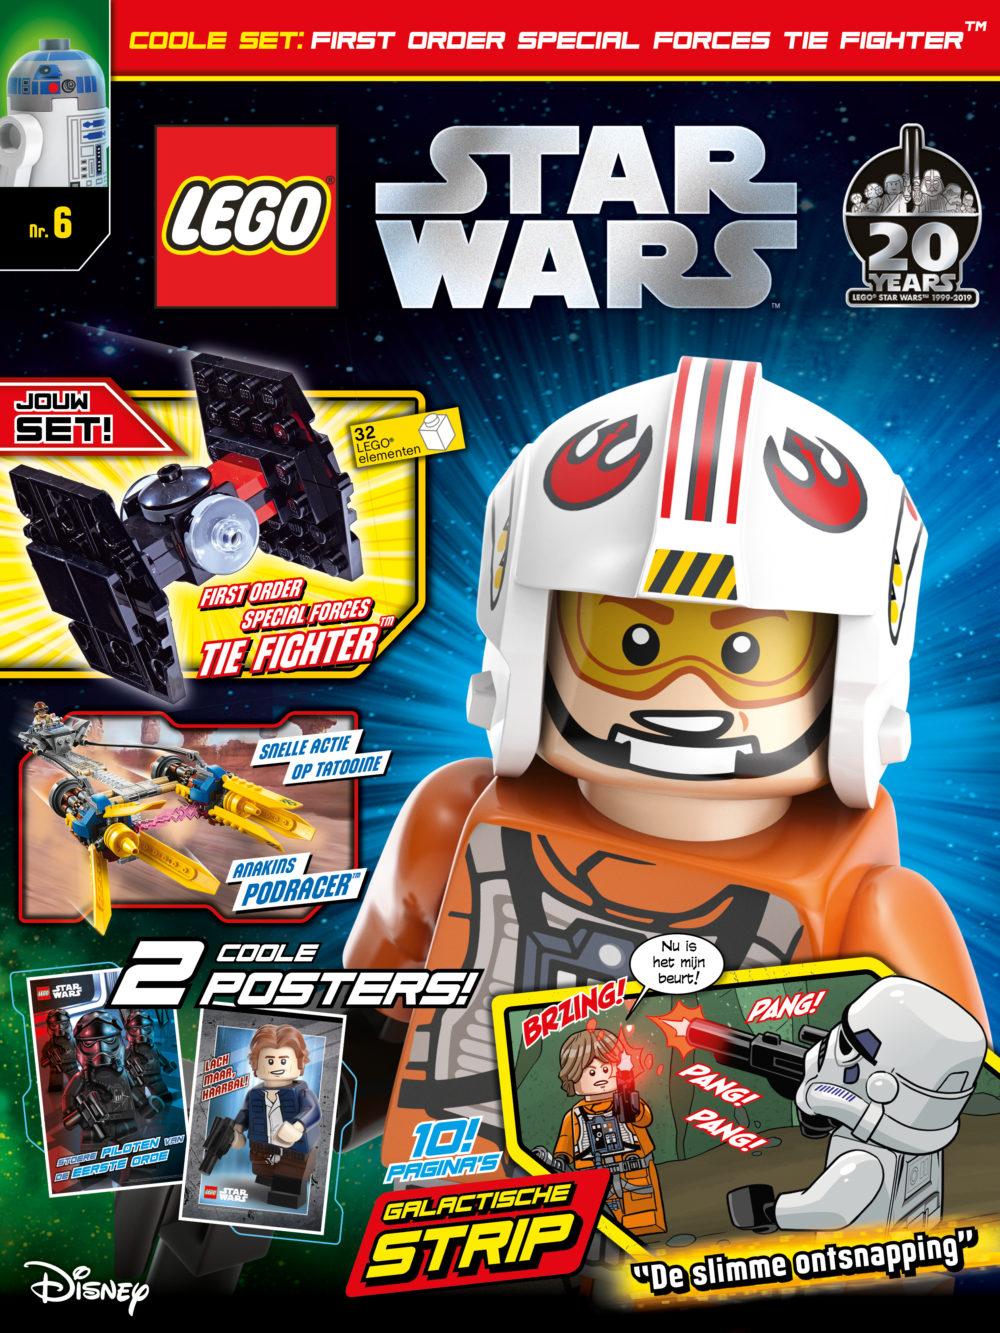 LEGO Star Wars Magazine 6 2019